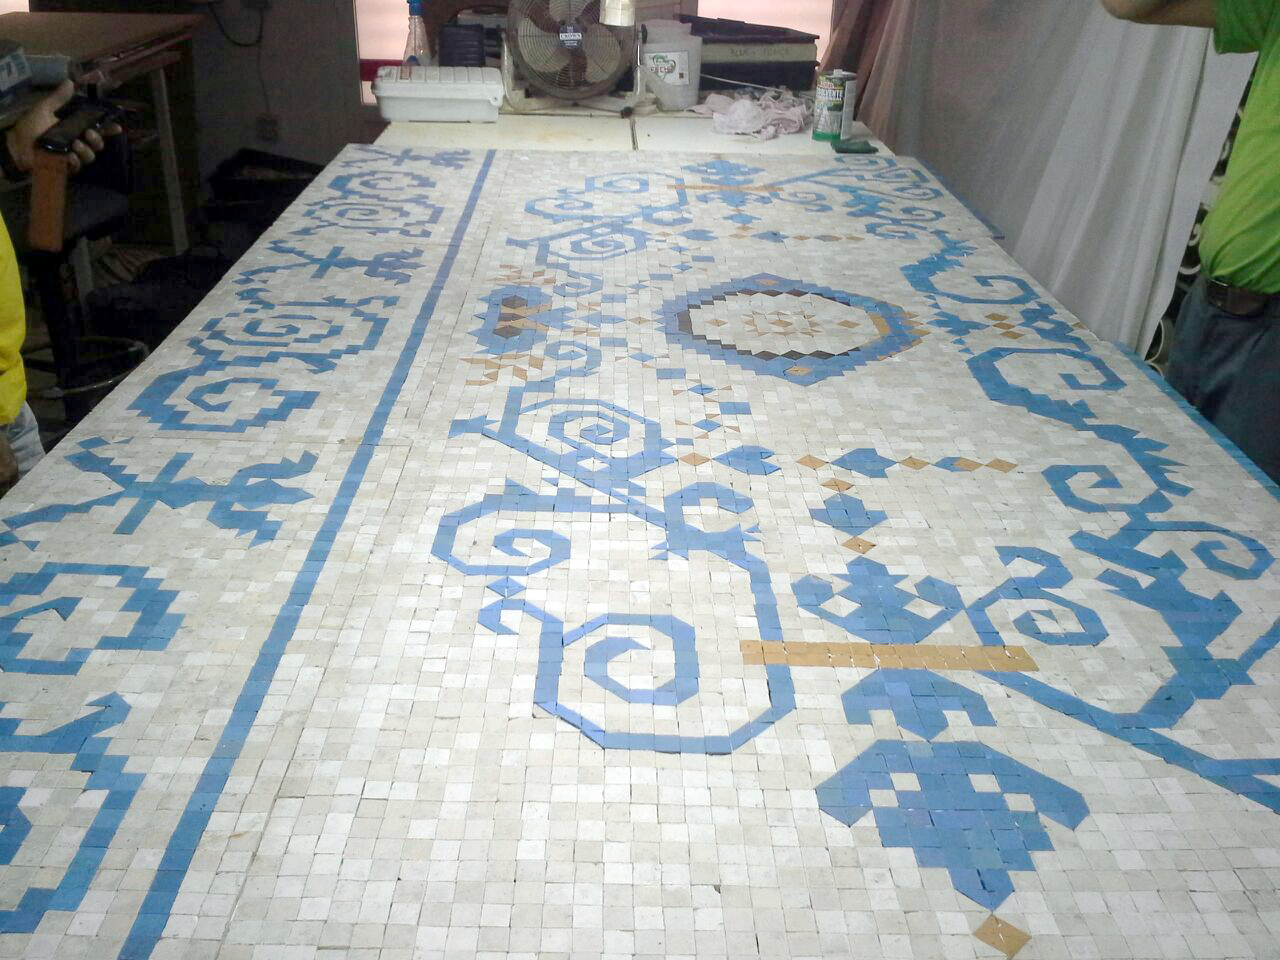 restauracion-de-pavimento-de-mosaico-romano